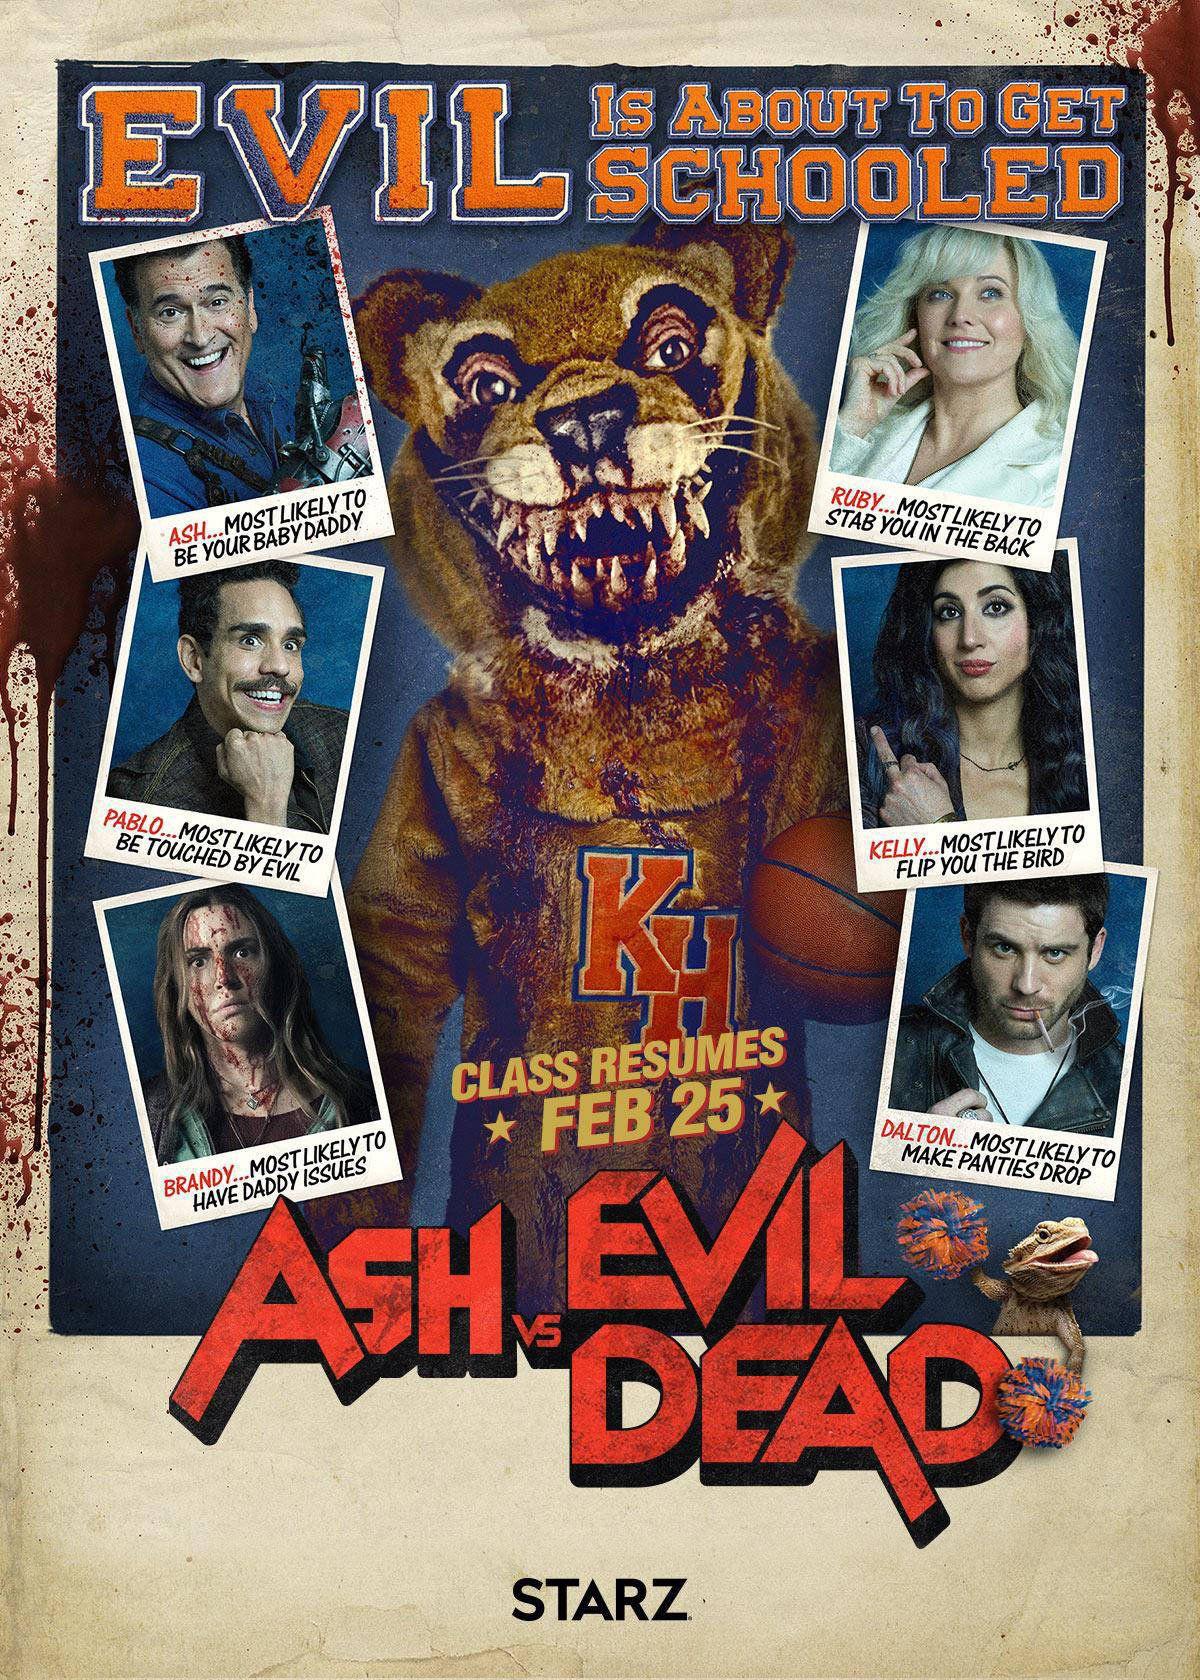 Ash vs Evil Dead cover